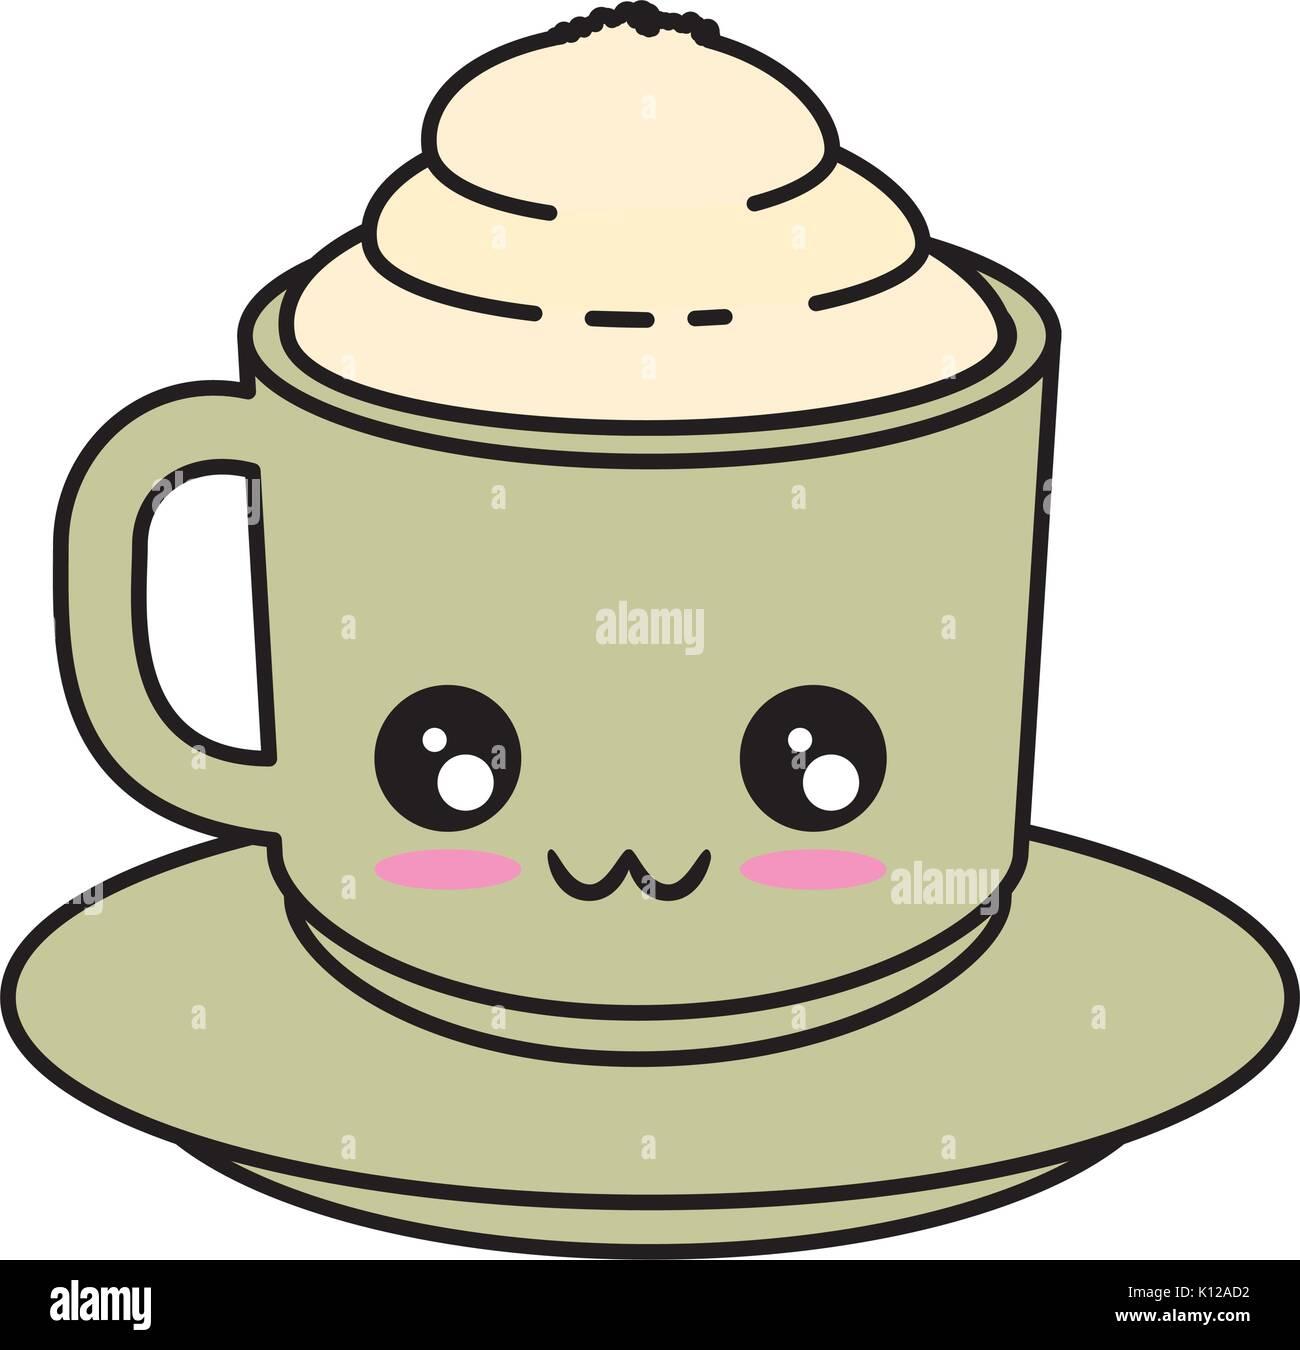 Delicious Coffee Mug Kawaii Cute Cartoon Vector Ilustration Stock Vector Image Art Alamy